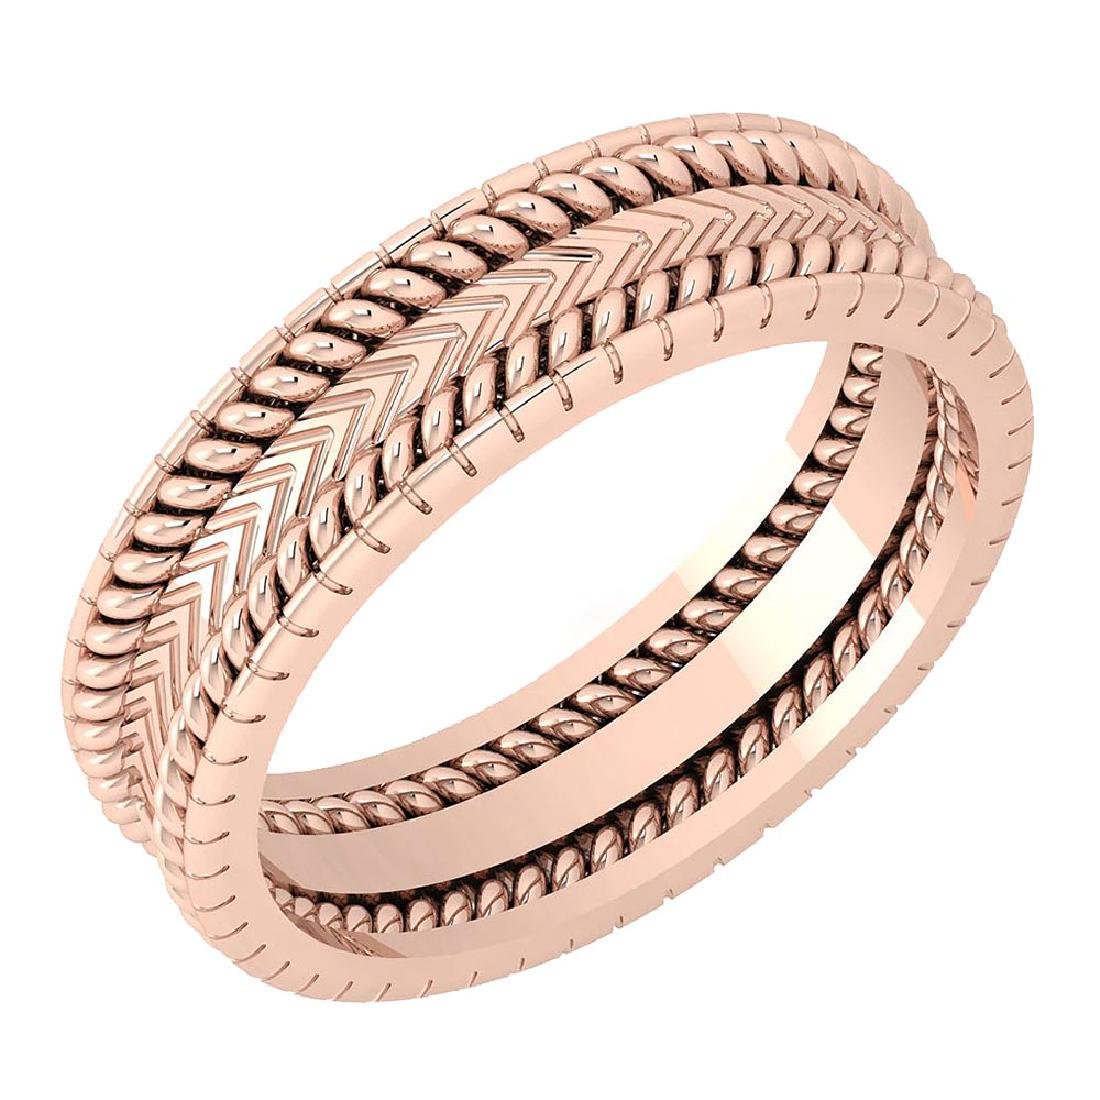 Stunning Filigree Engagement Band 18K Rose Gold MADE IN